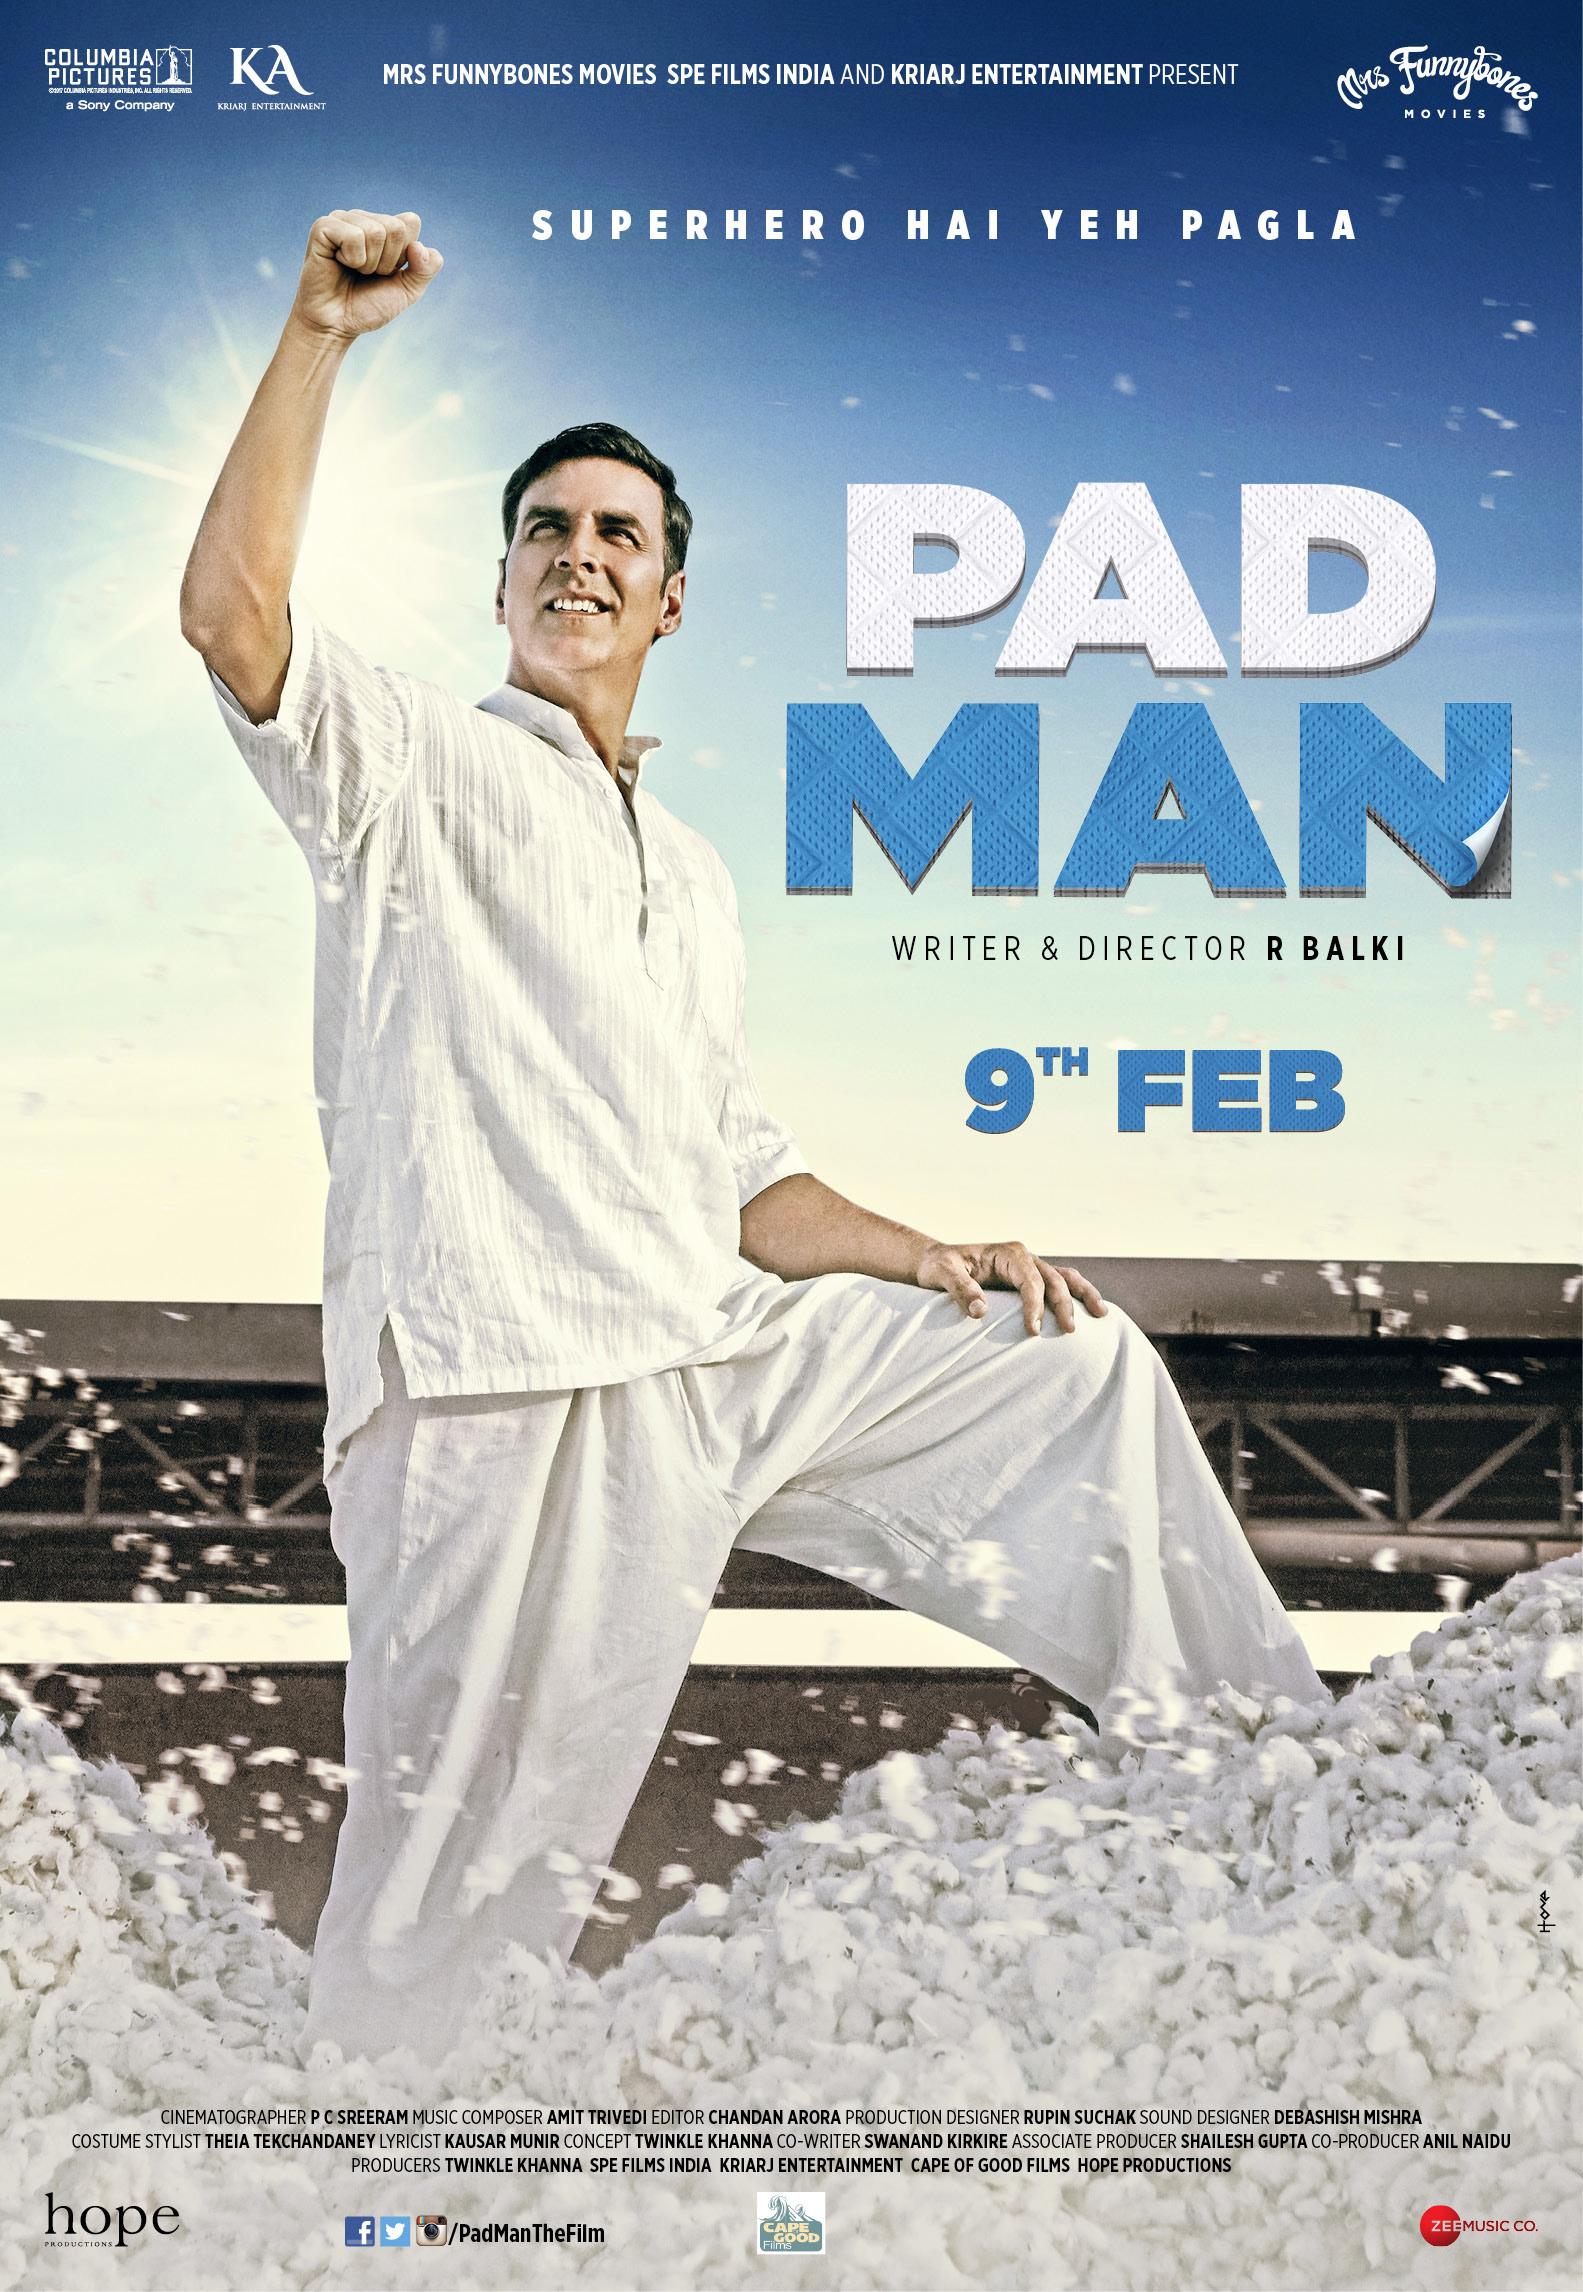 Padman (2018) Full Hindi Movie by Akshay Kumar & Sonam Kapoor